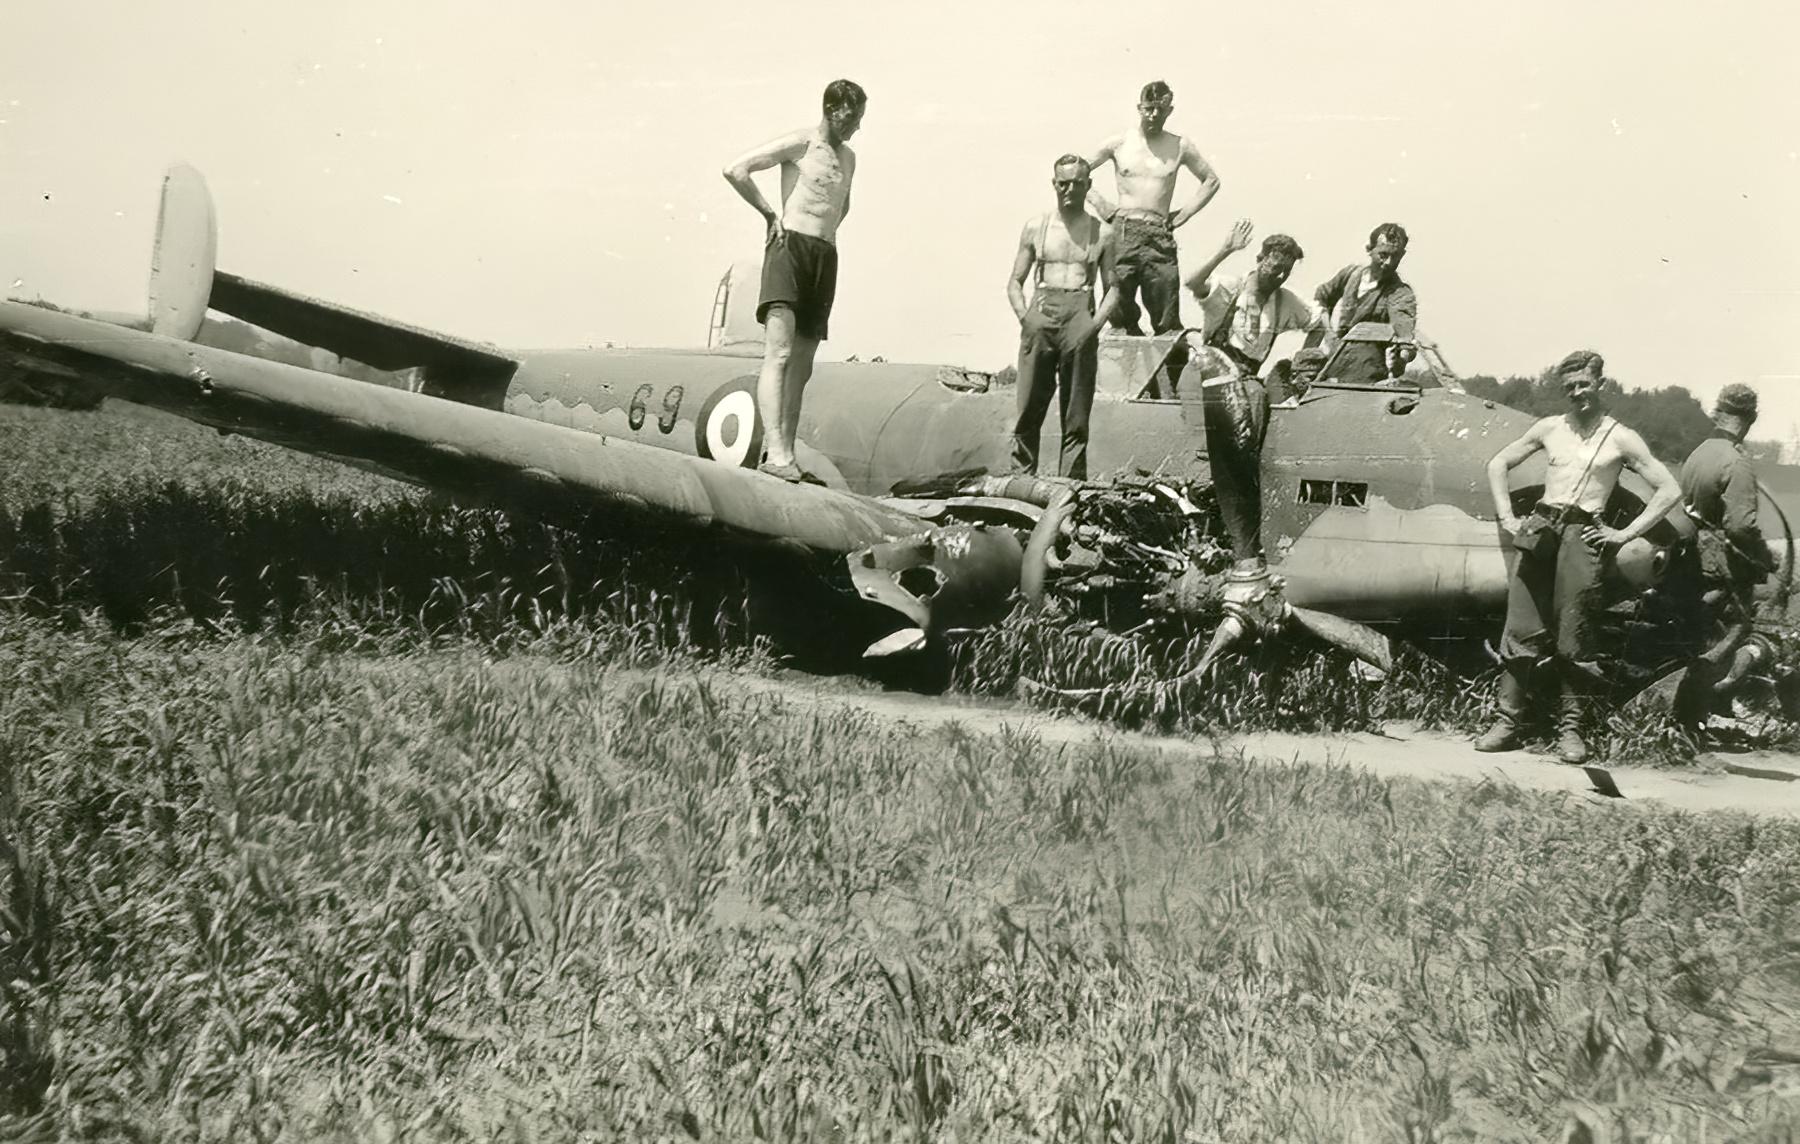 French Airforce Potez 630 Black 69 force landed battle of France May Jun 1940 ebay 01